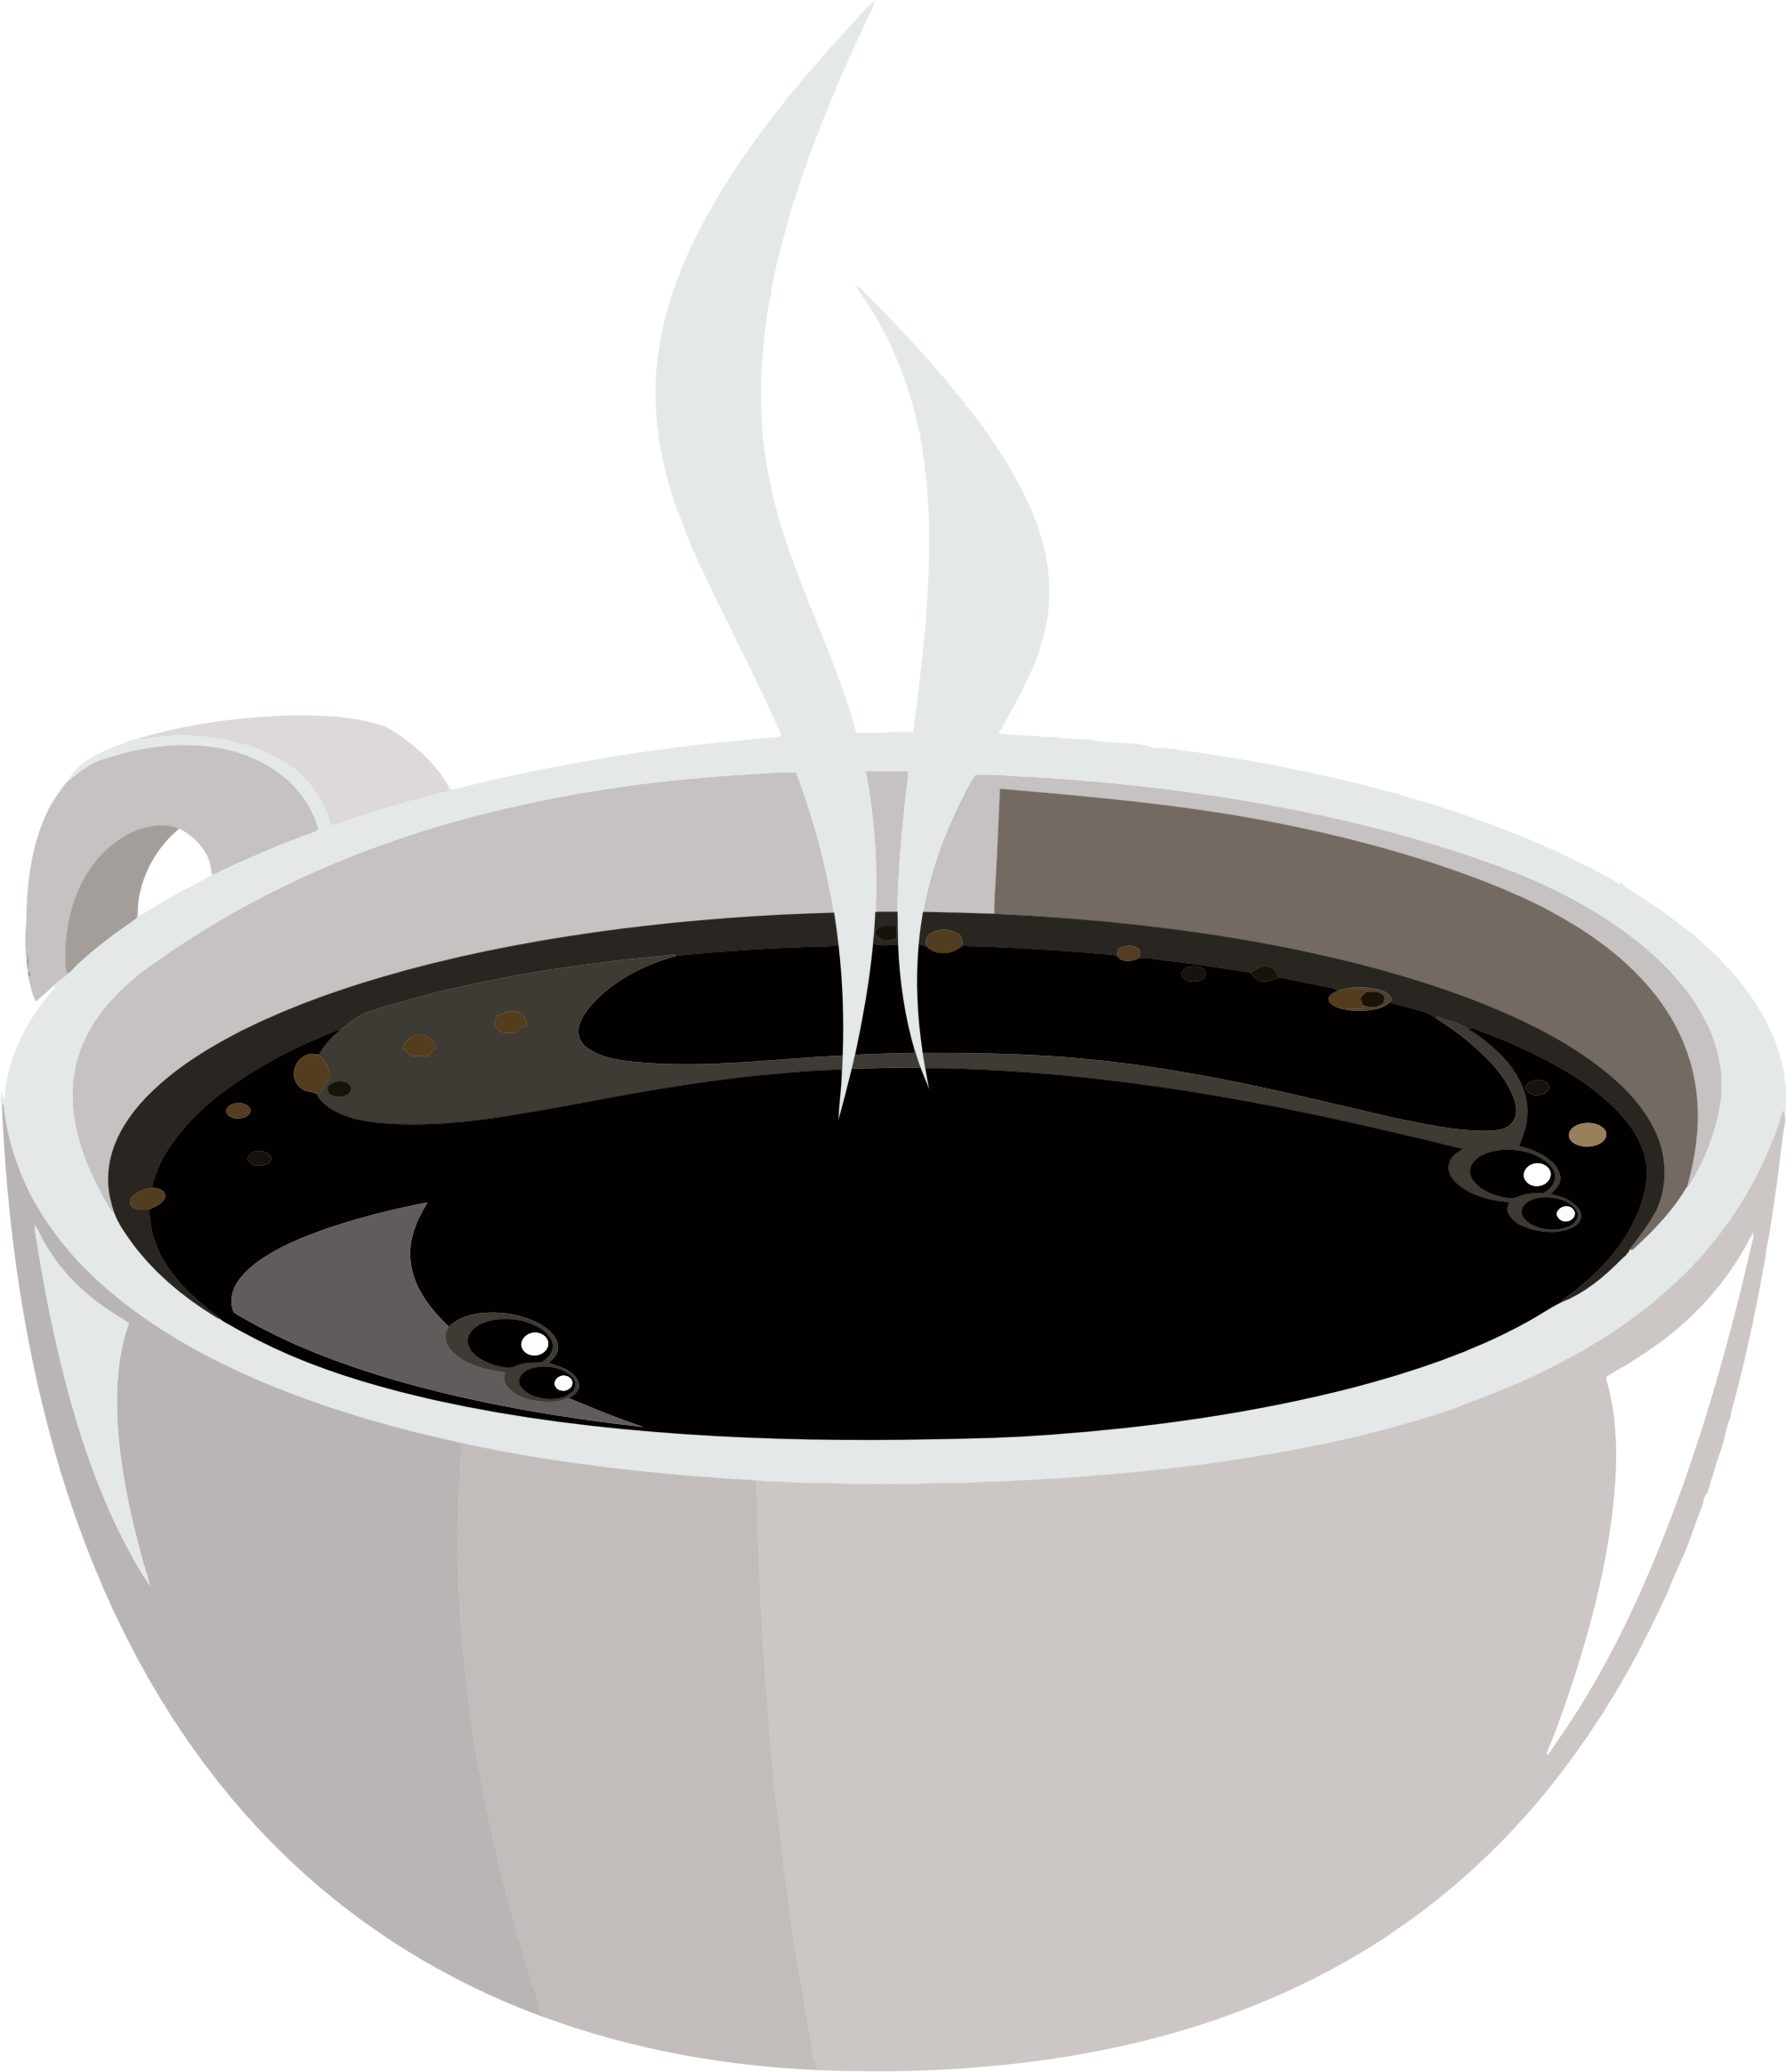 Clipart coffee liquid. Hot cup of big